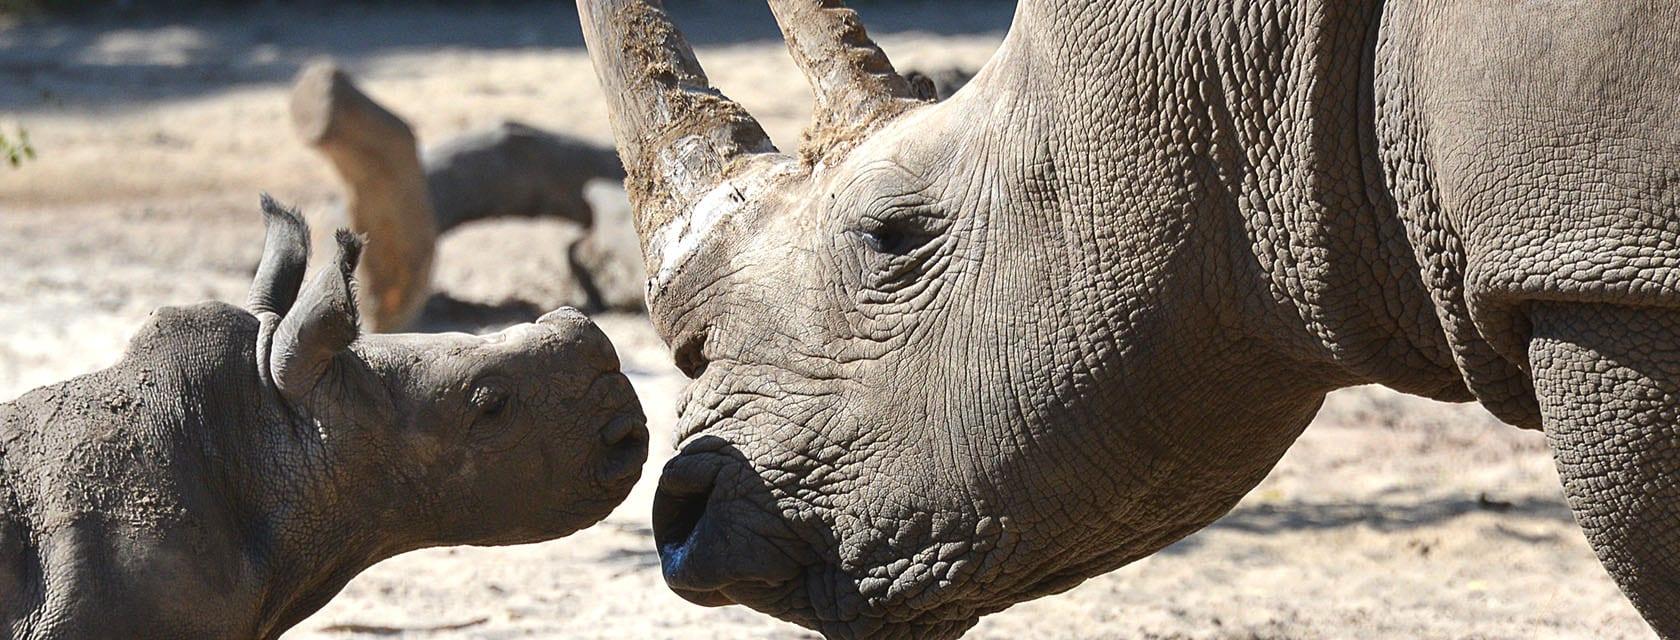 Donate to help endangered species like the white rhino